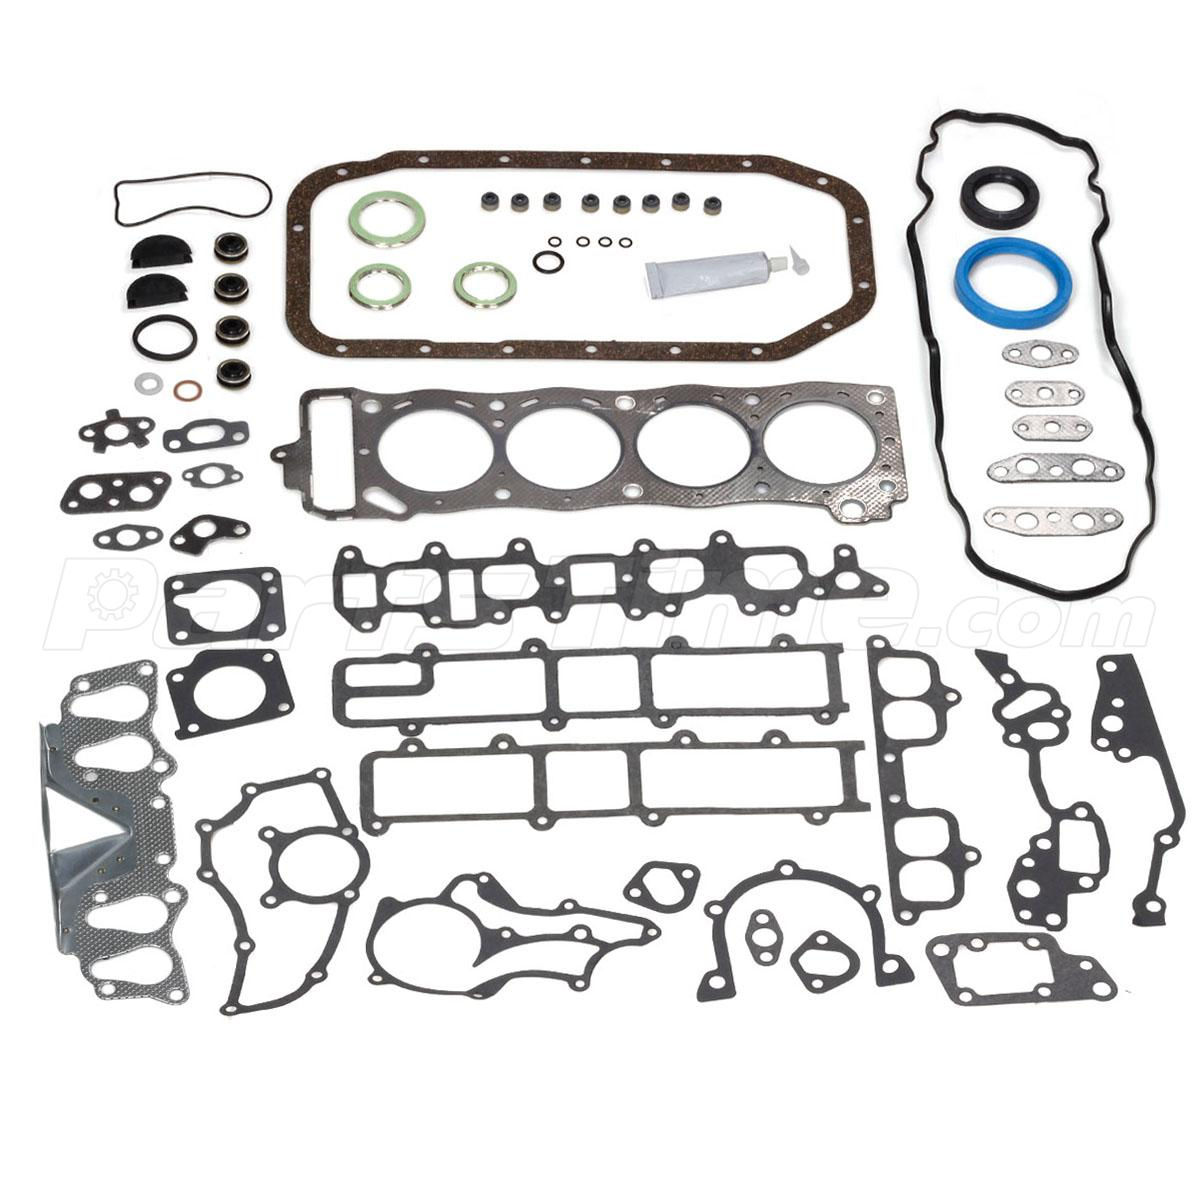 Cylinder Head Gasket For Toyota 4runner Pickup 22r 22re